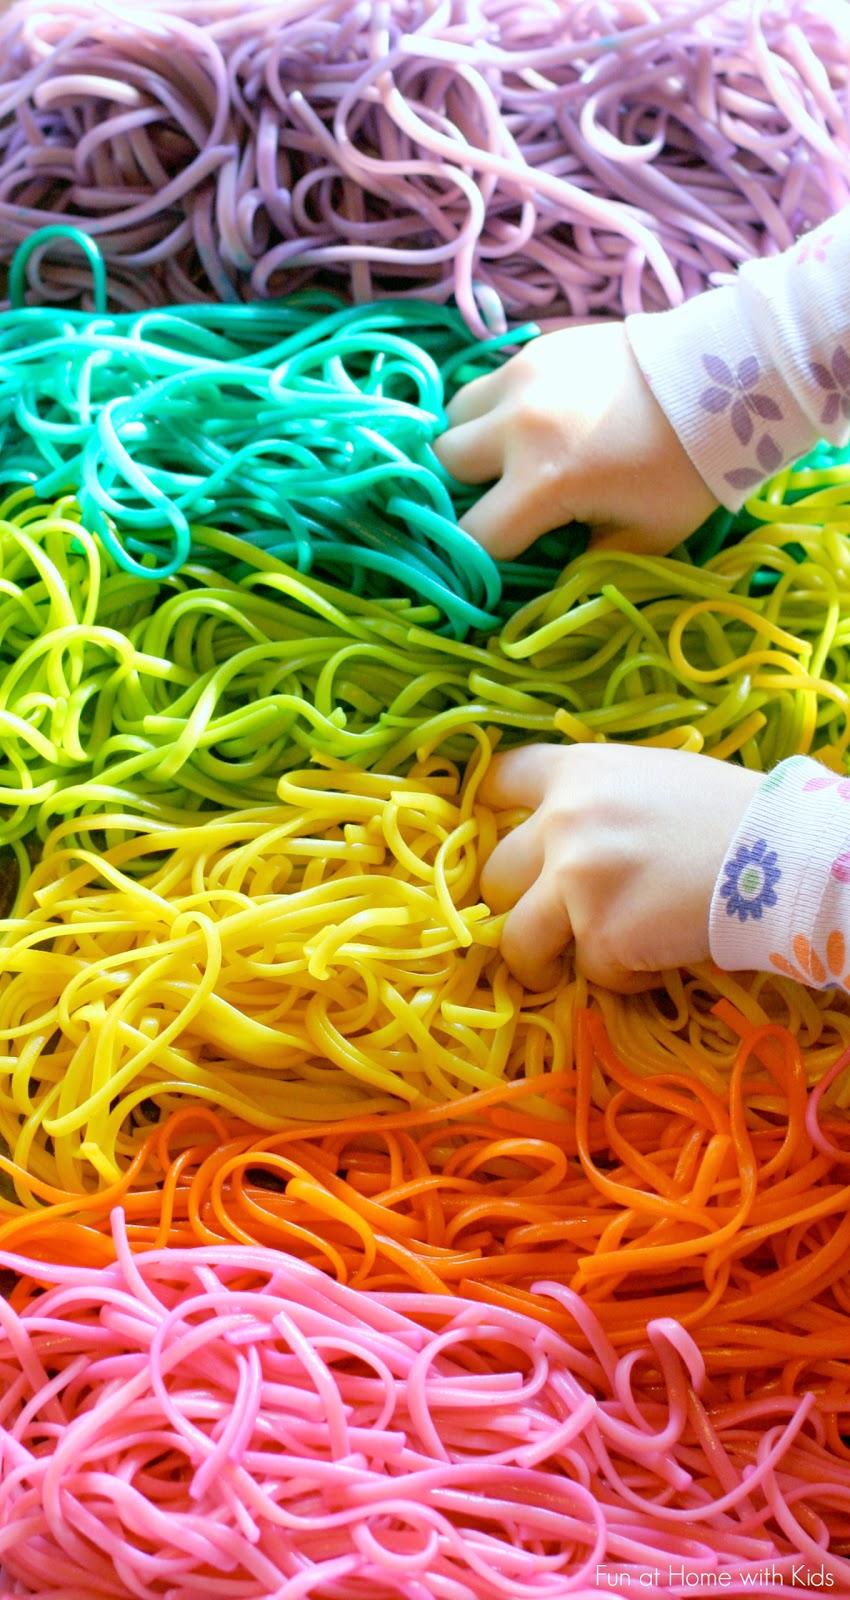 Rainbow Spaghetti Sensory Play. Click for more colorful St. Patrick's Day Sensory Bins